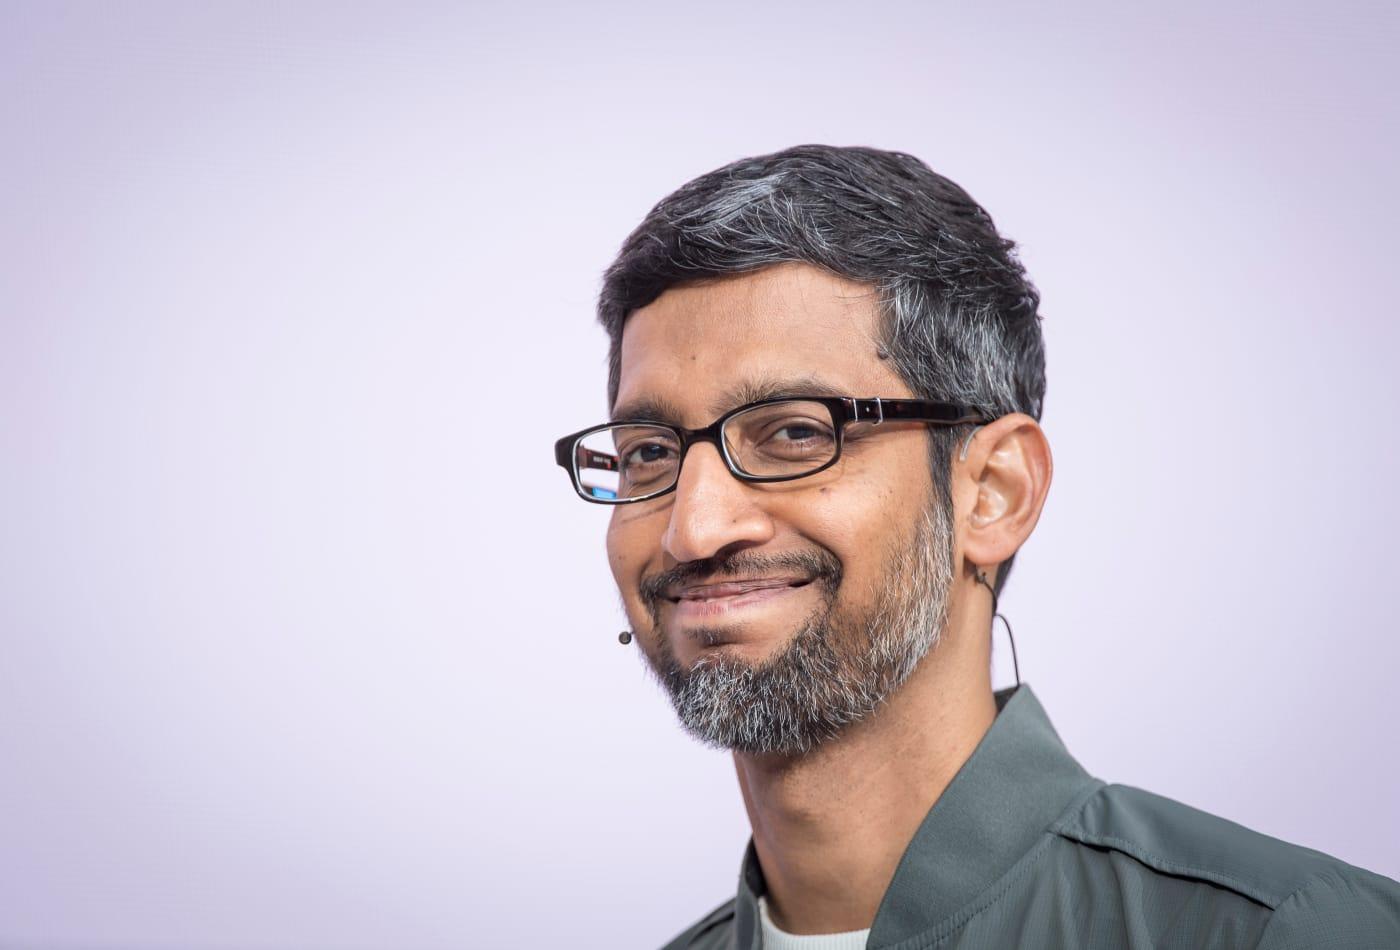 Alphabet, Google's parent company, hits trillion-dollar market cap for first time